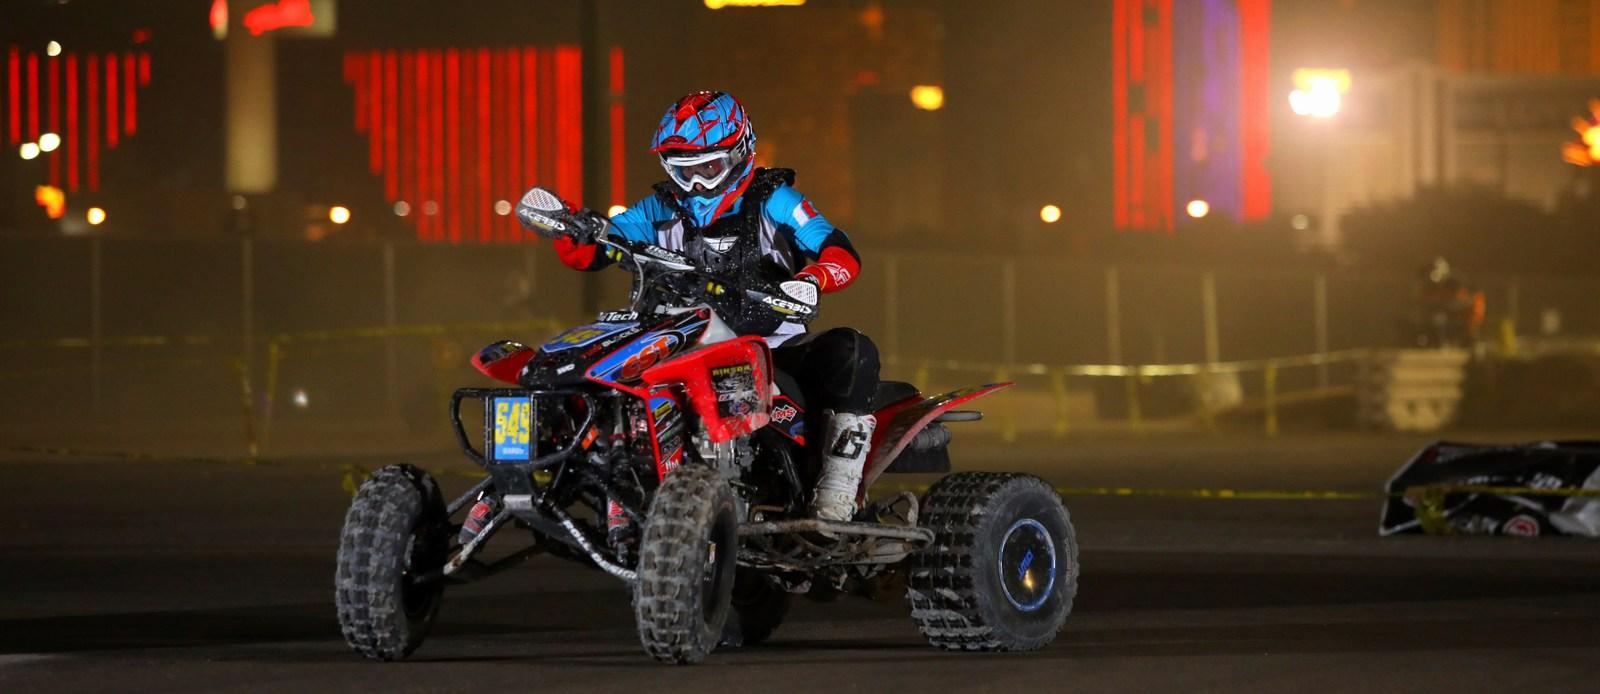 2019-04-beau-baron-las-vegas-atv-worcs-racing